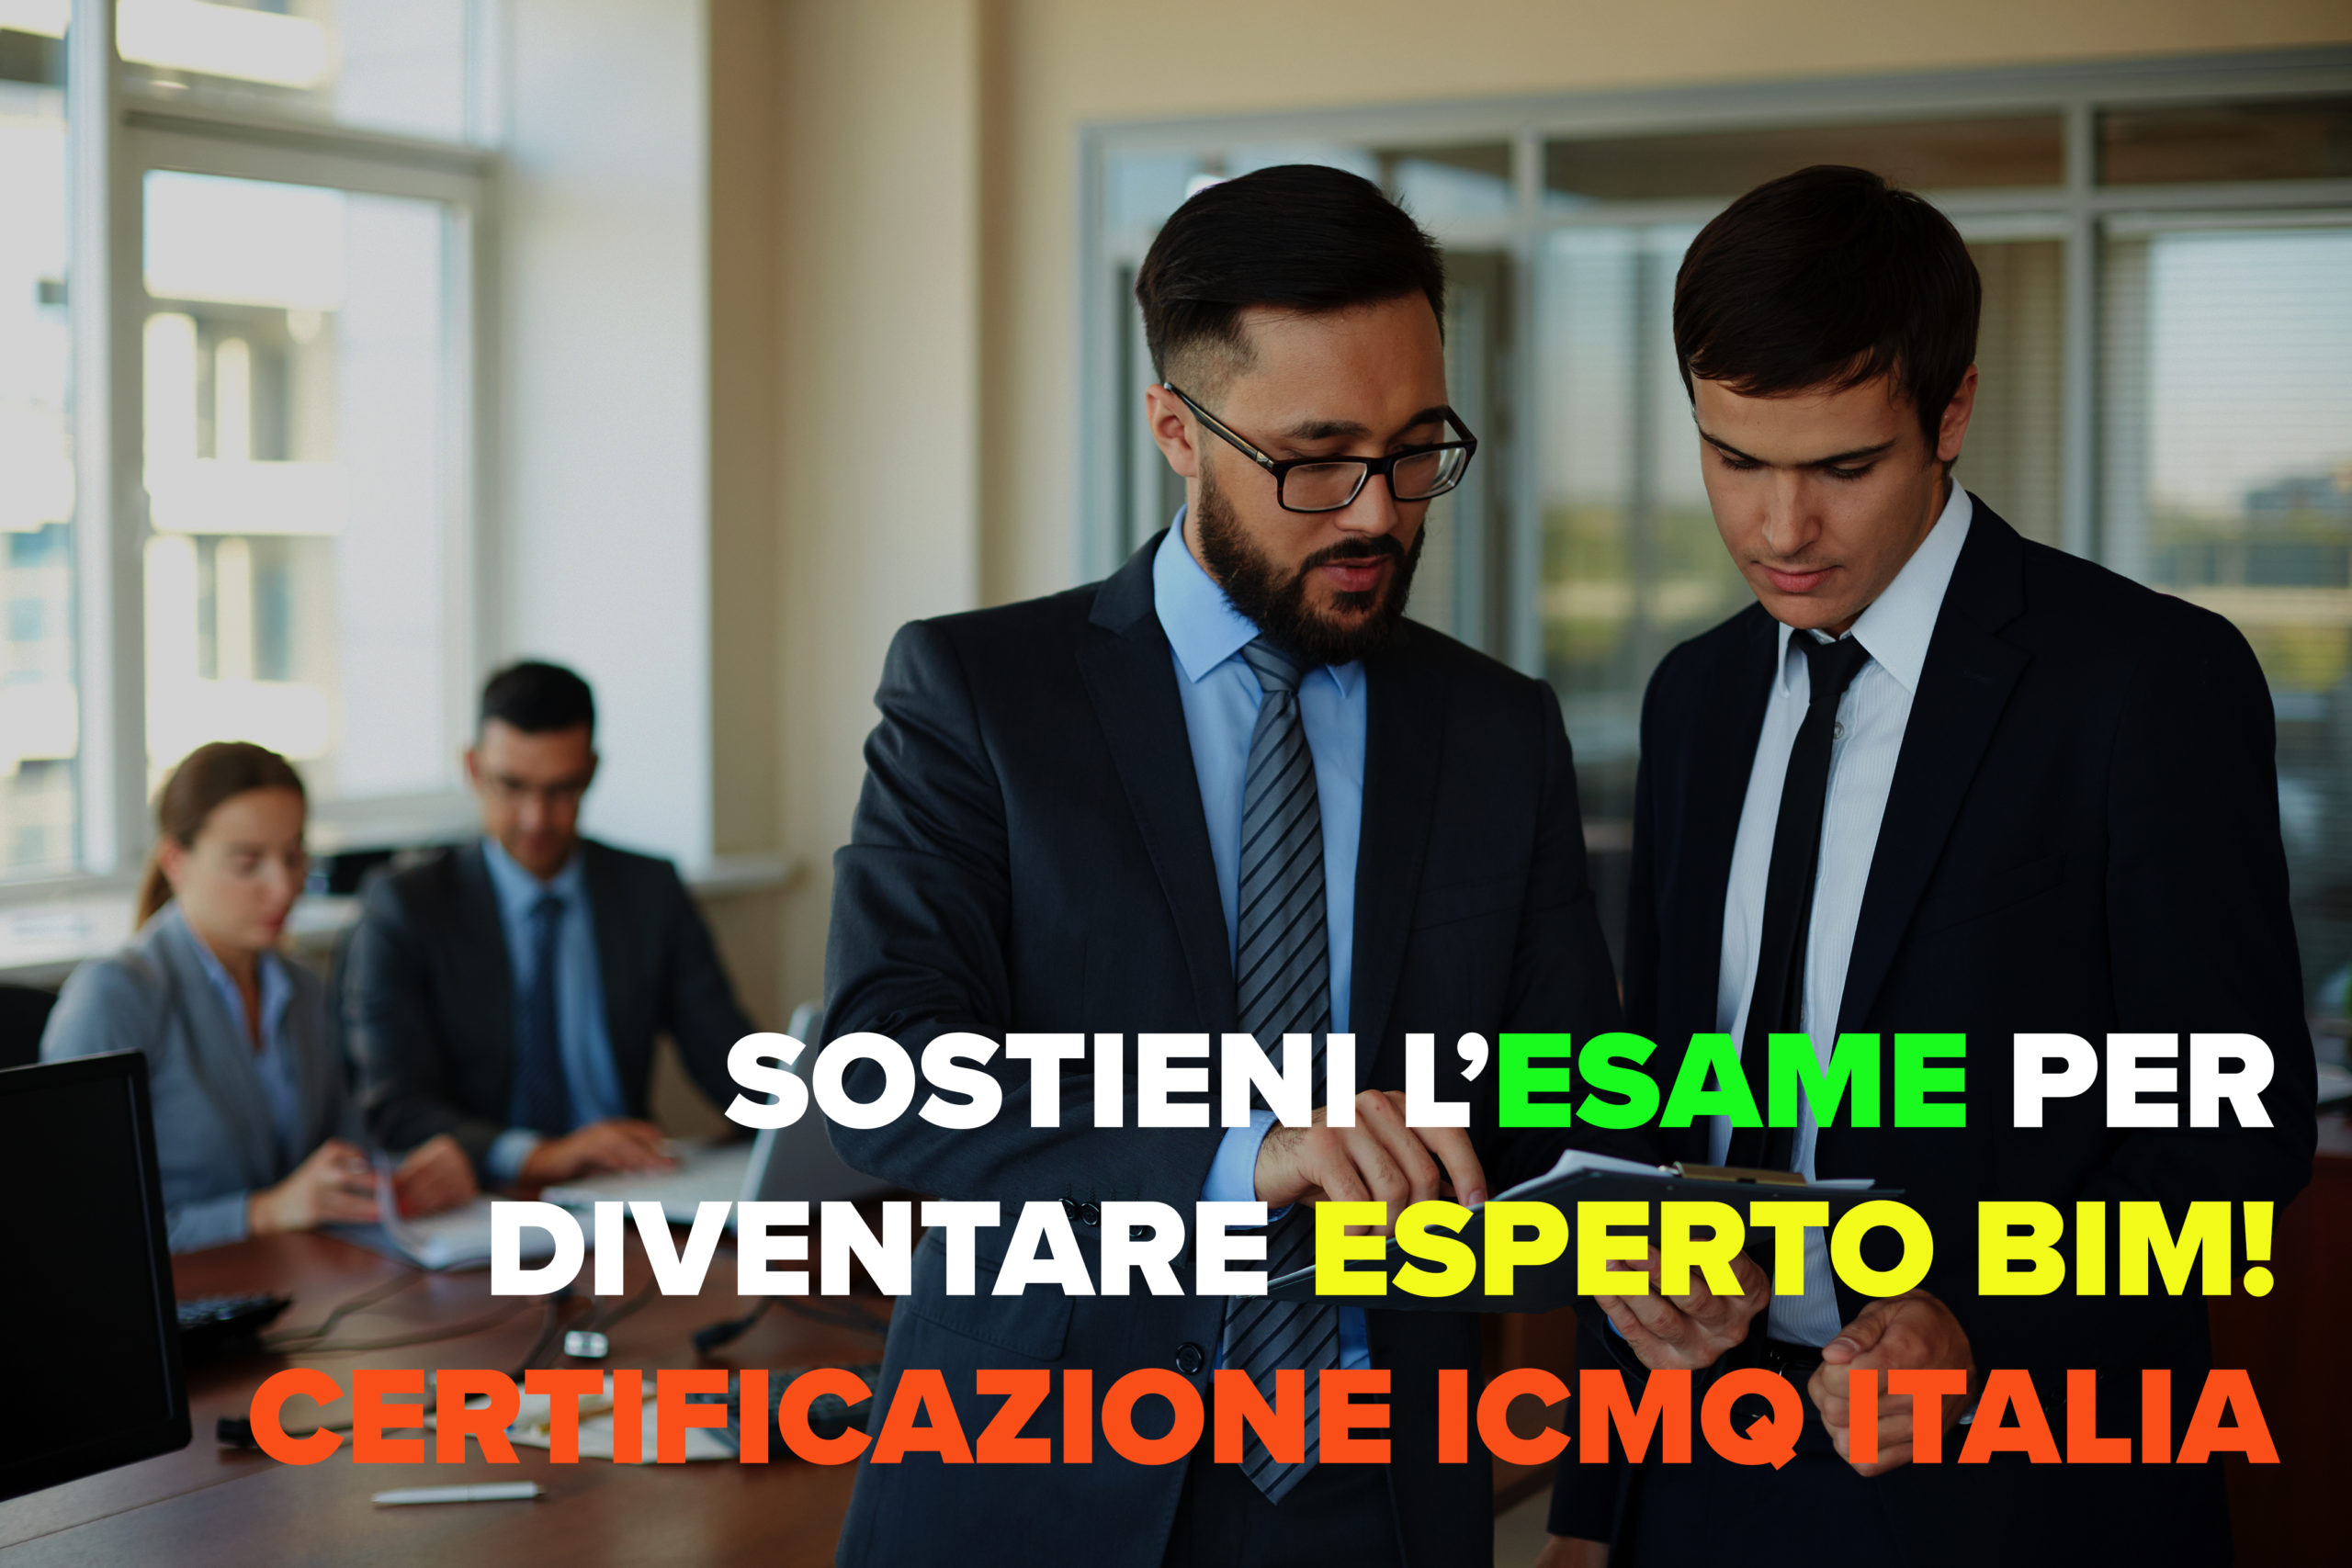 esami icmq - certificazione bim - bim specialist - archicad - architettura - roma - cosenza - archicad